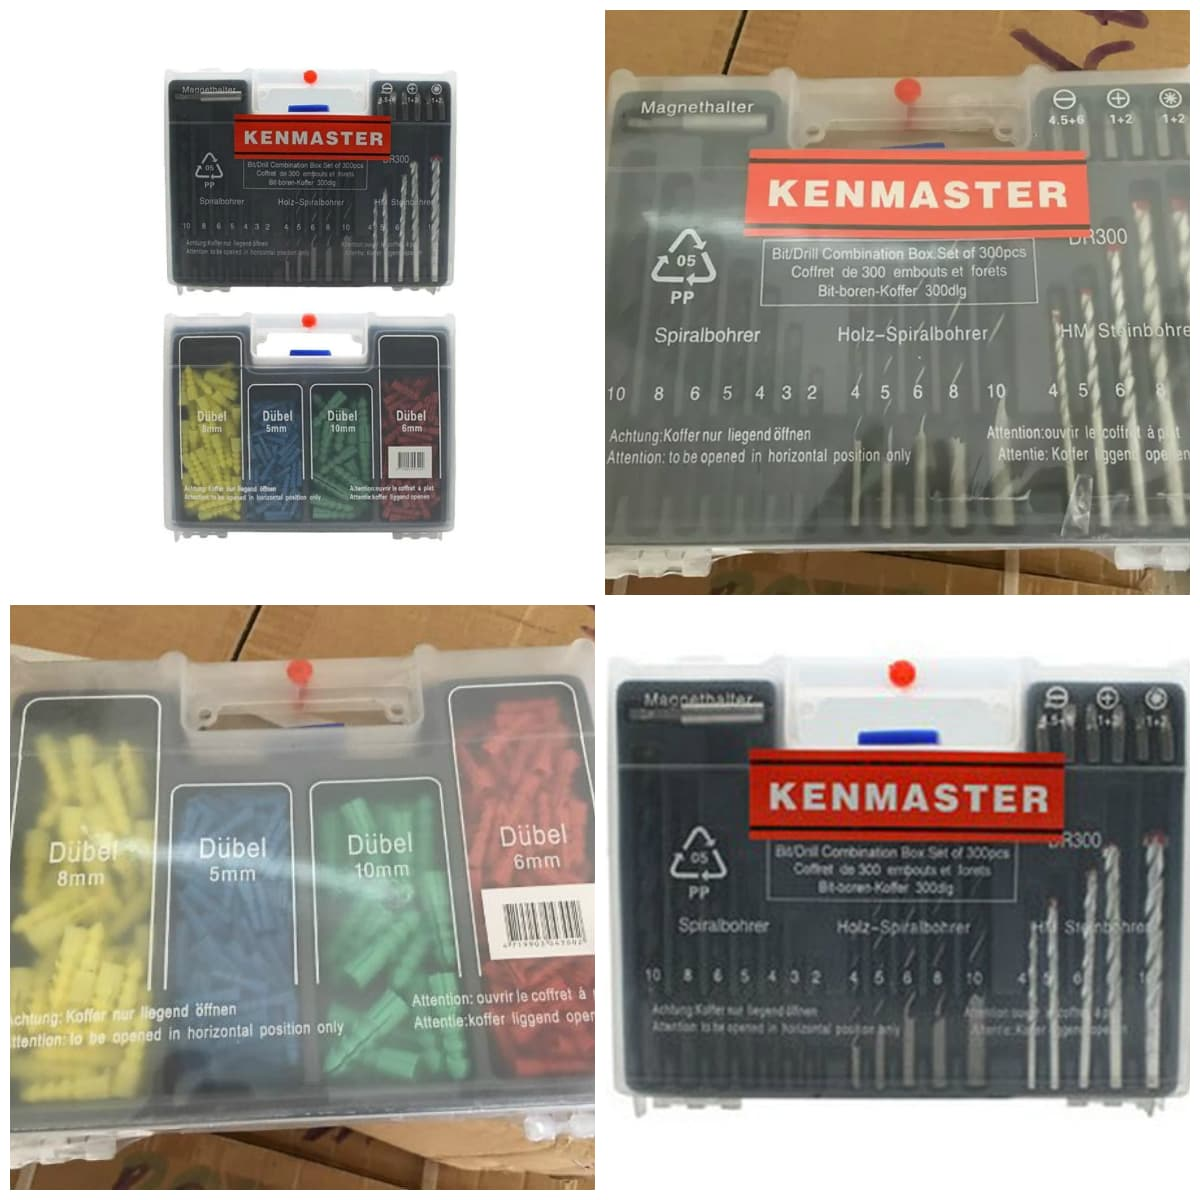 ... Paket Mesin Bor Mollar Mlr - Ed430 + Mata Bor Set & Tool Kit Kenmaster +